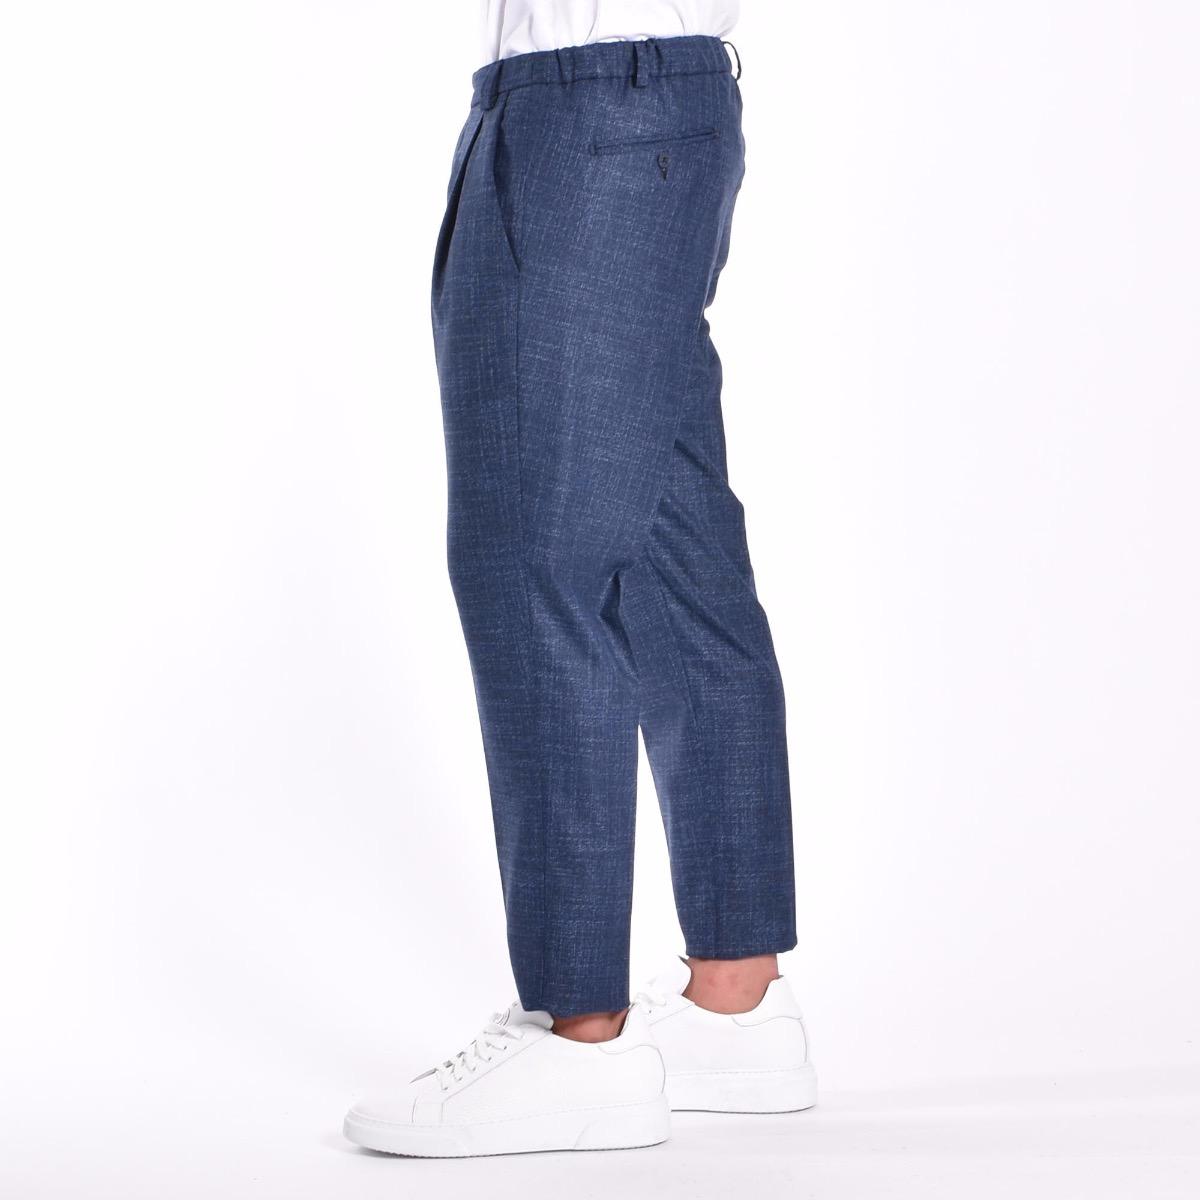 Pantalone misto lino - Blu grigio